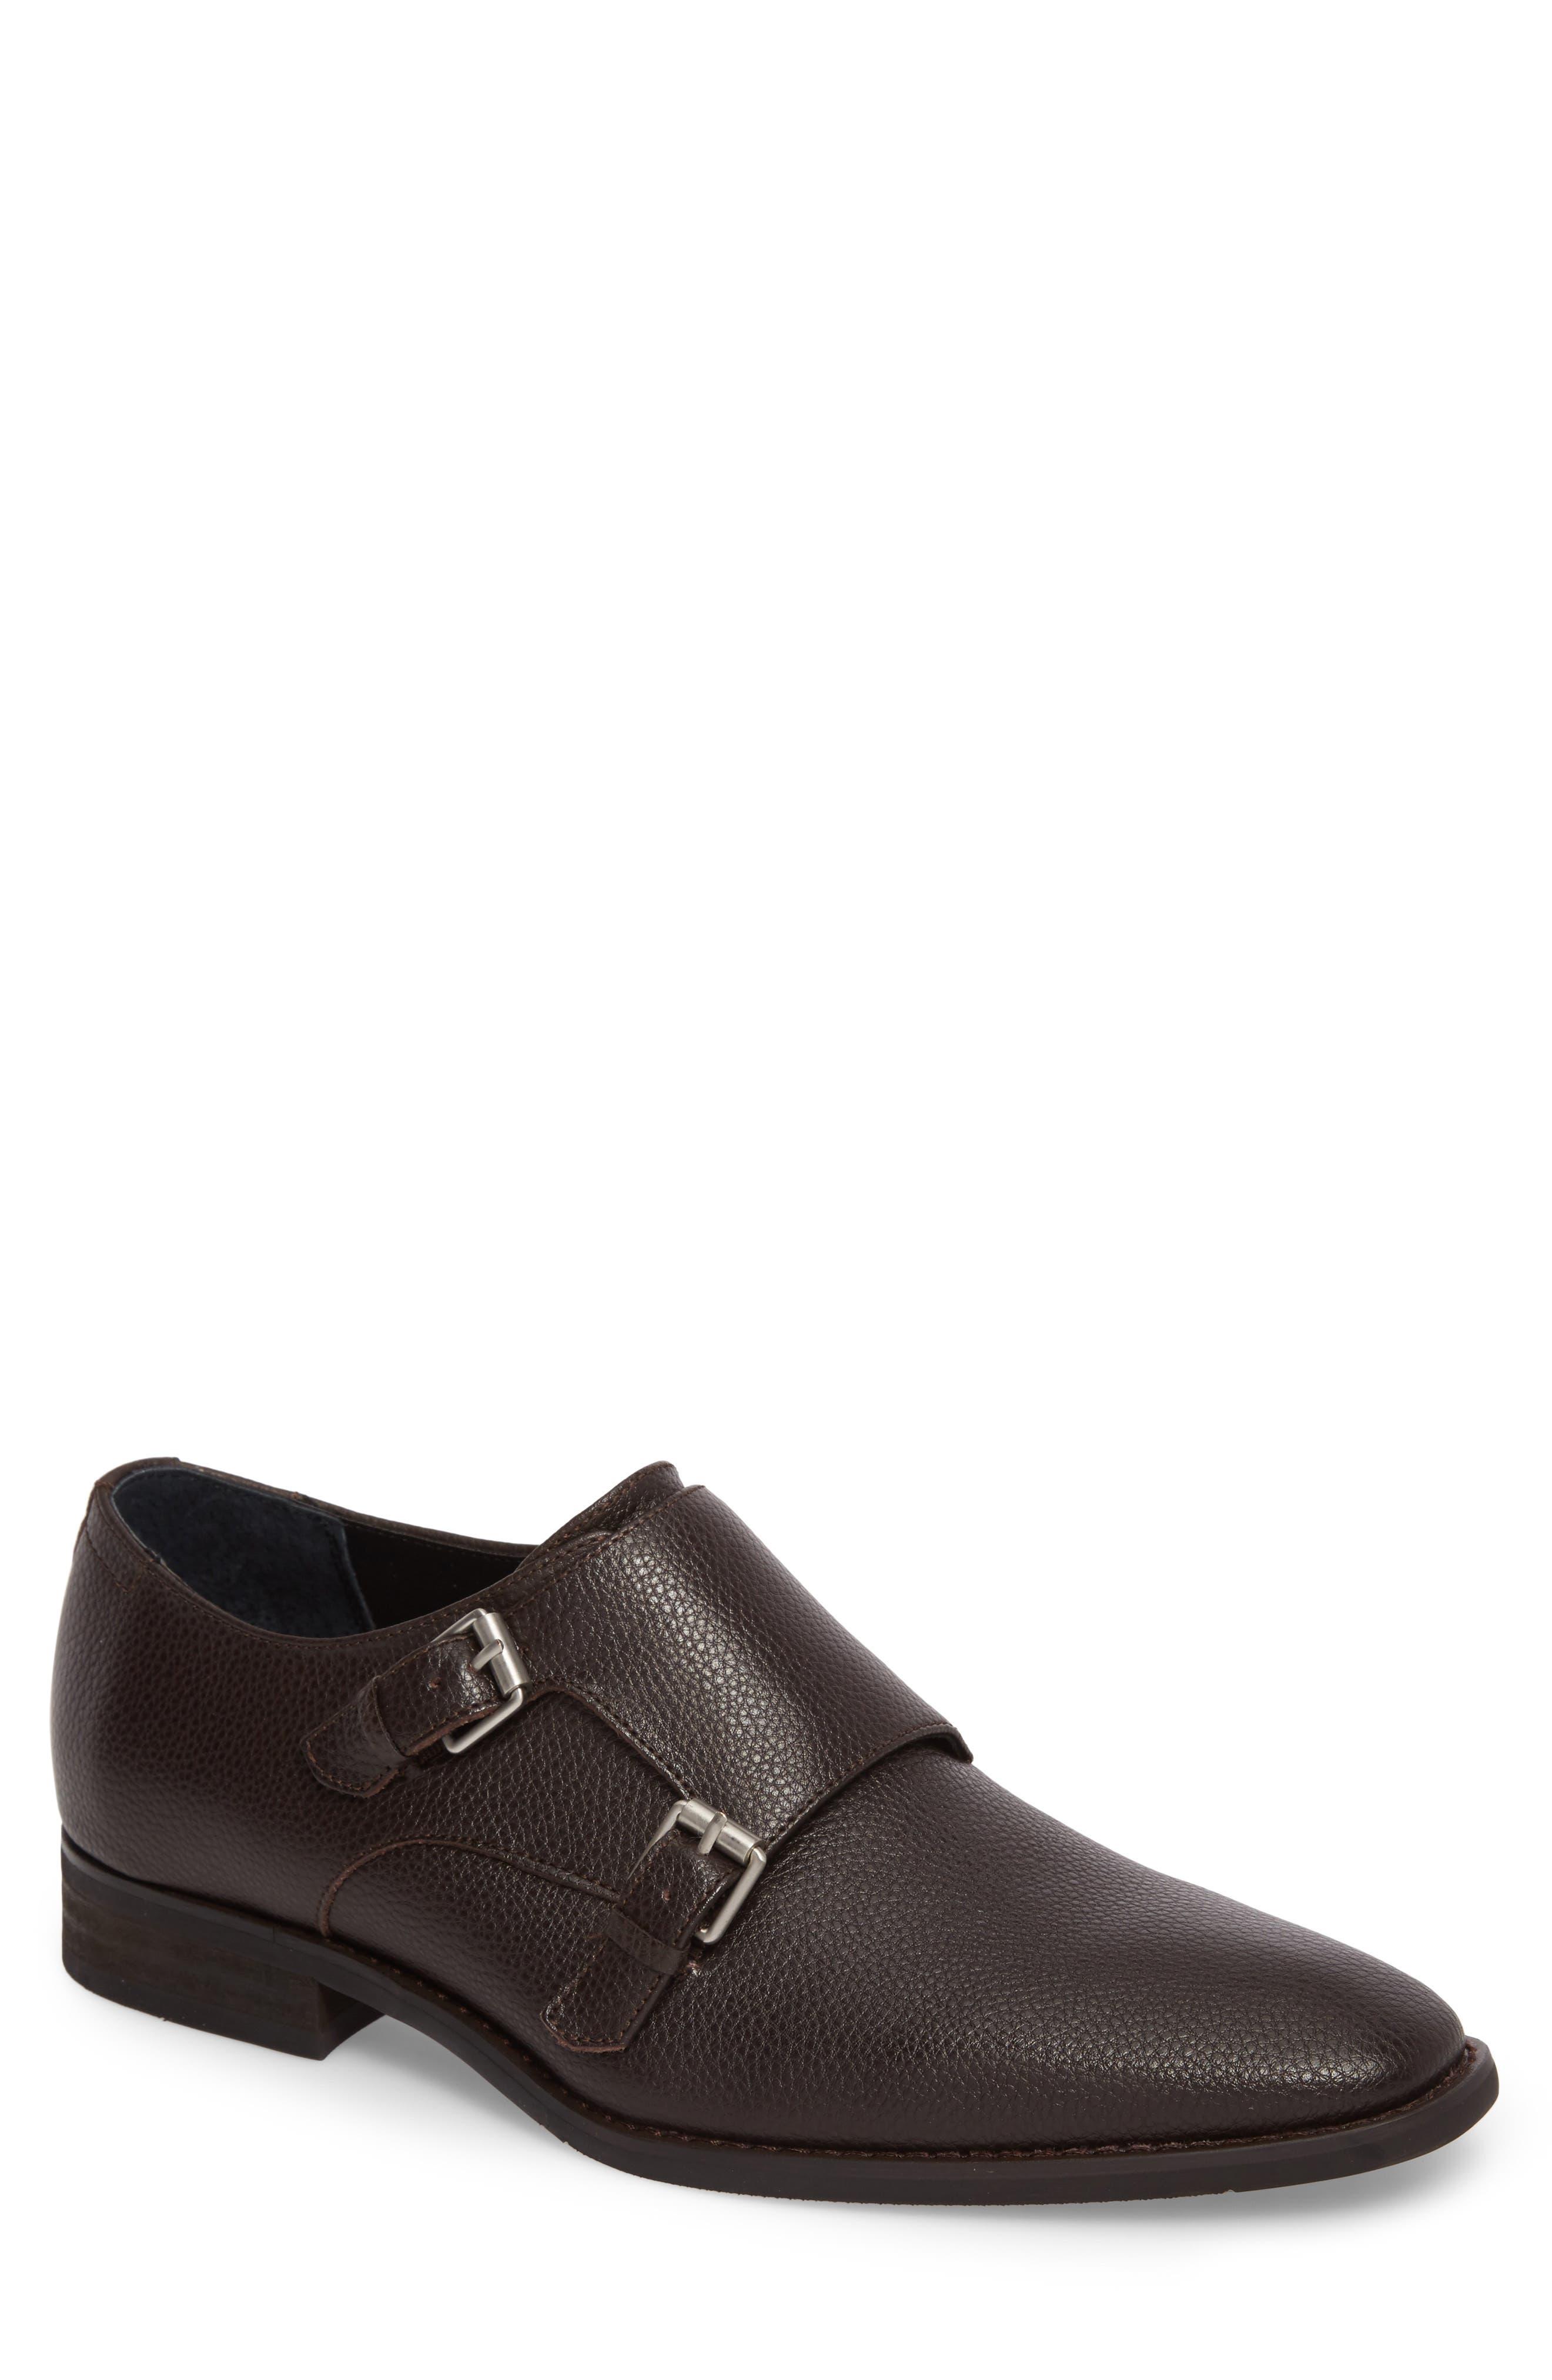 Robbie Double Monk Strap Shoe,                             Main thumbnail 1, color,                             Dark Brown Leather